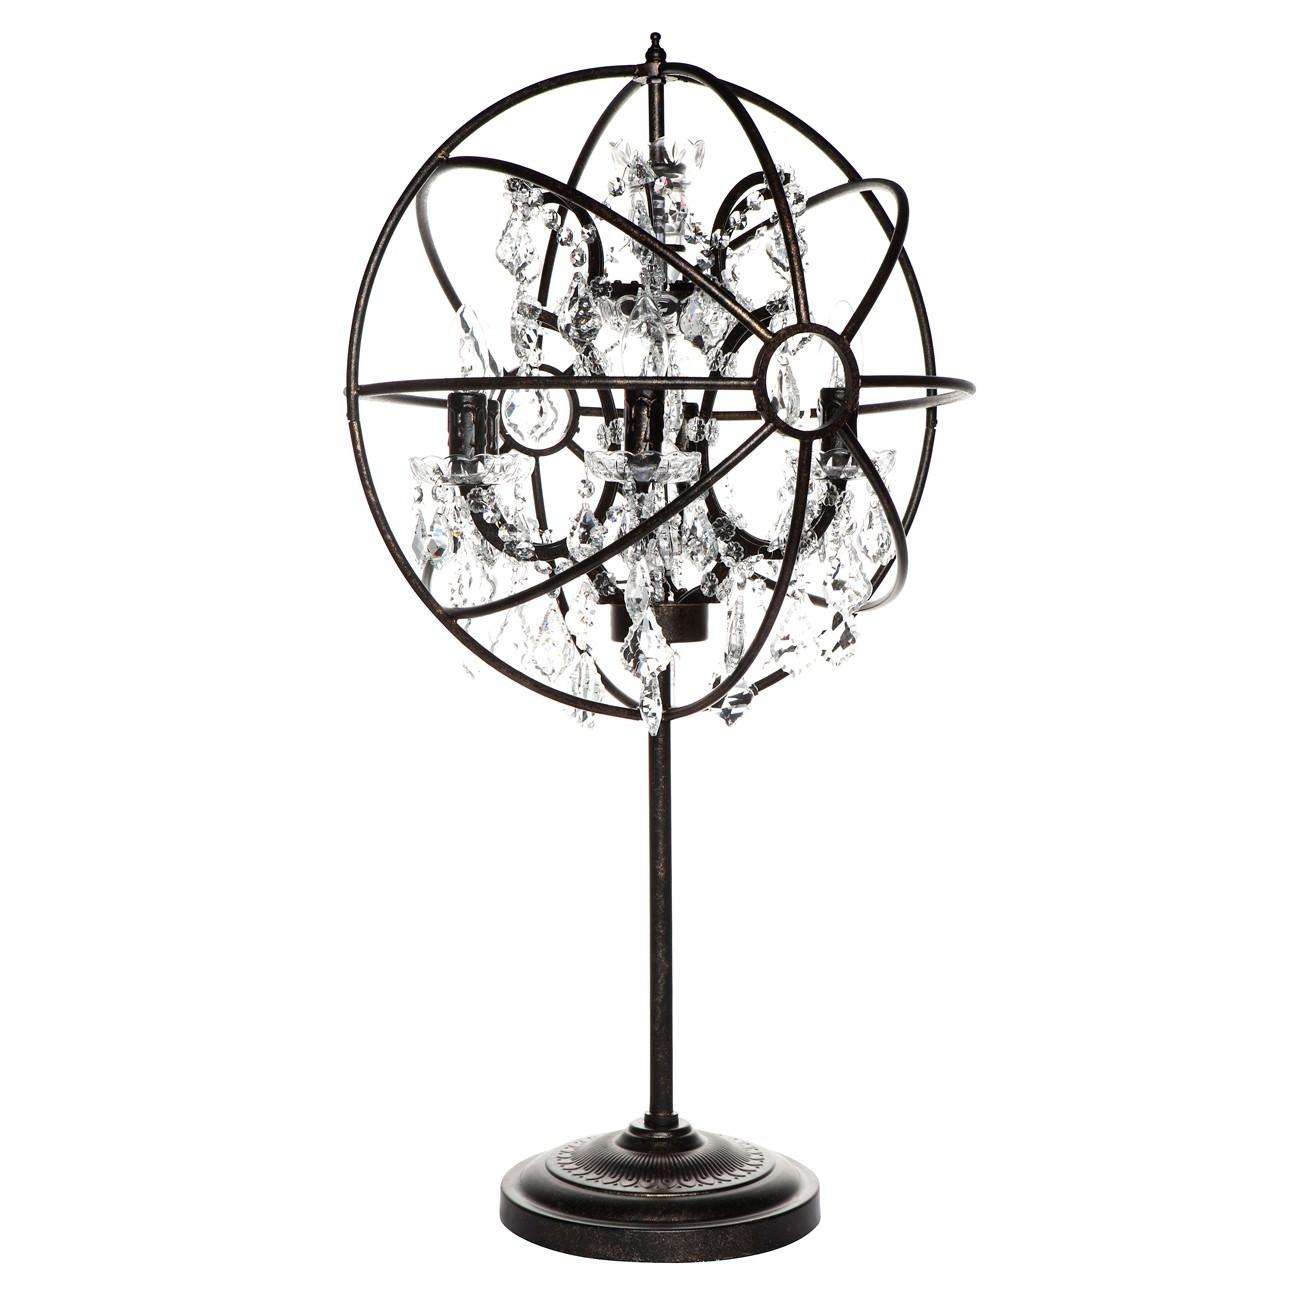 Oscar Iron & Glass Chandelier Table Lamp